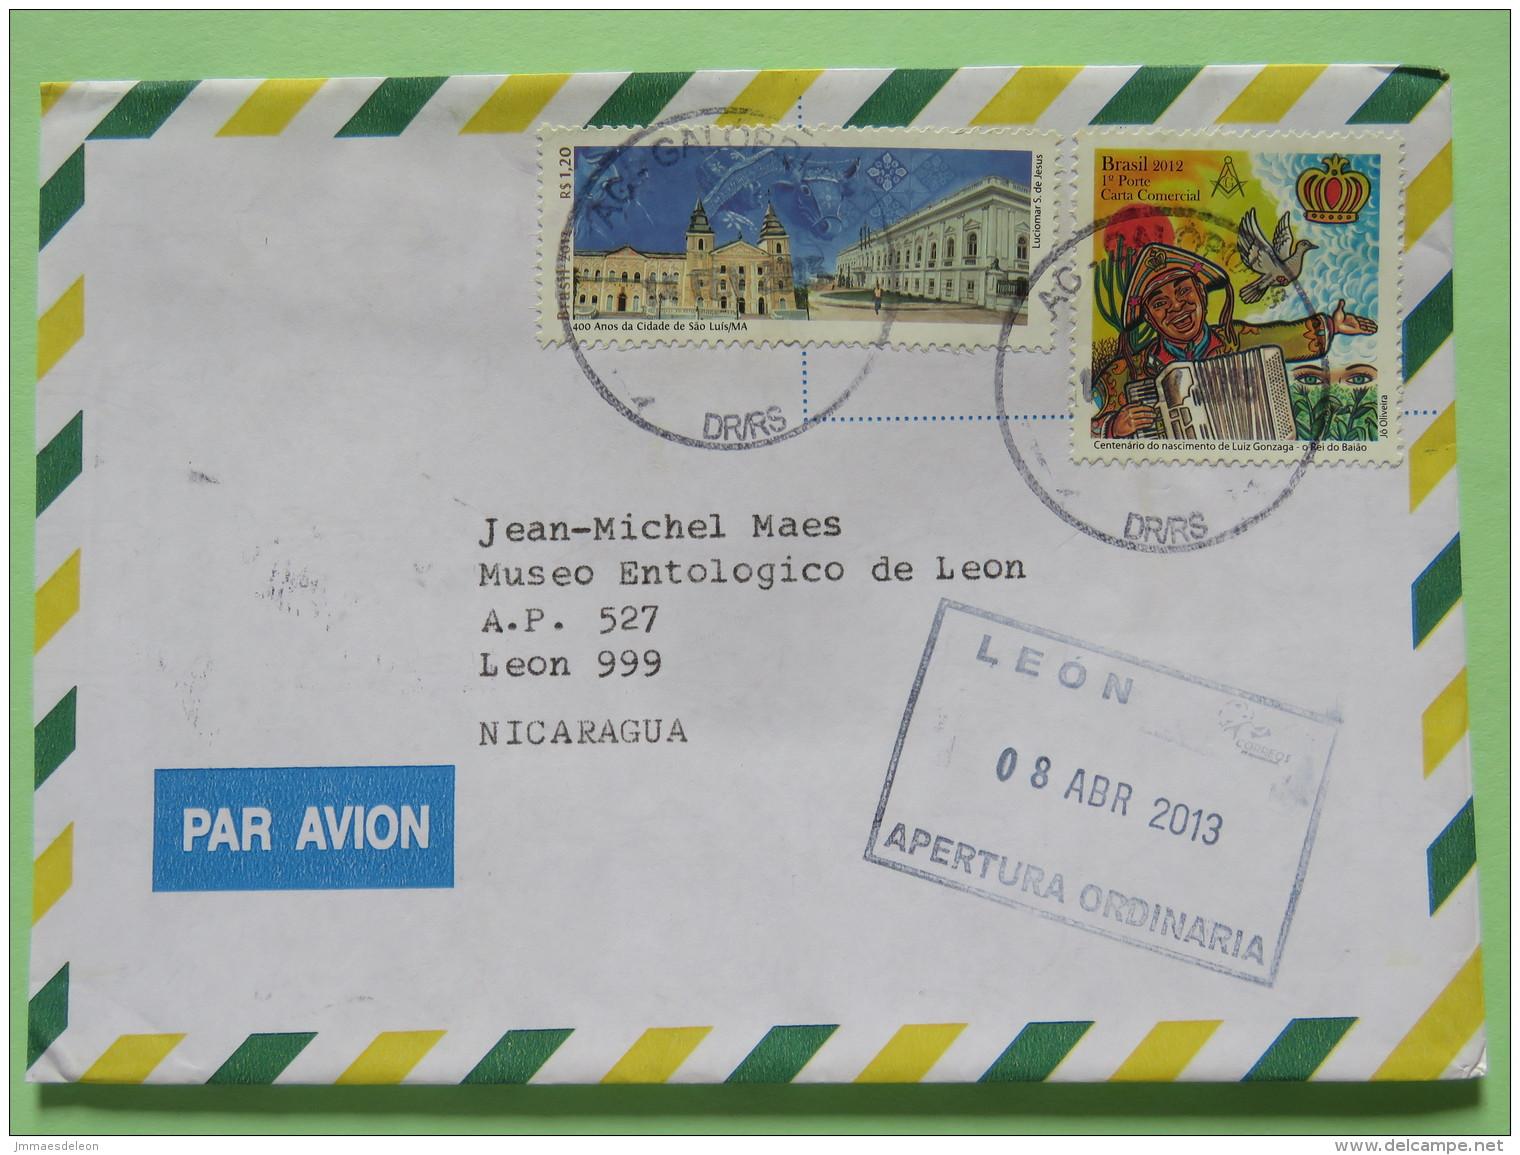 Brazil 2013 Cover Caxias Do Sul To Nicaragua - San Luis City - Music Dove Acordeon - Brazil